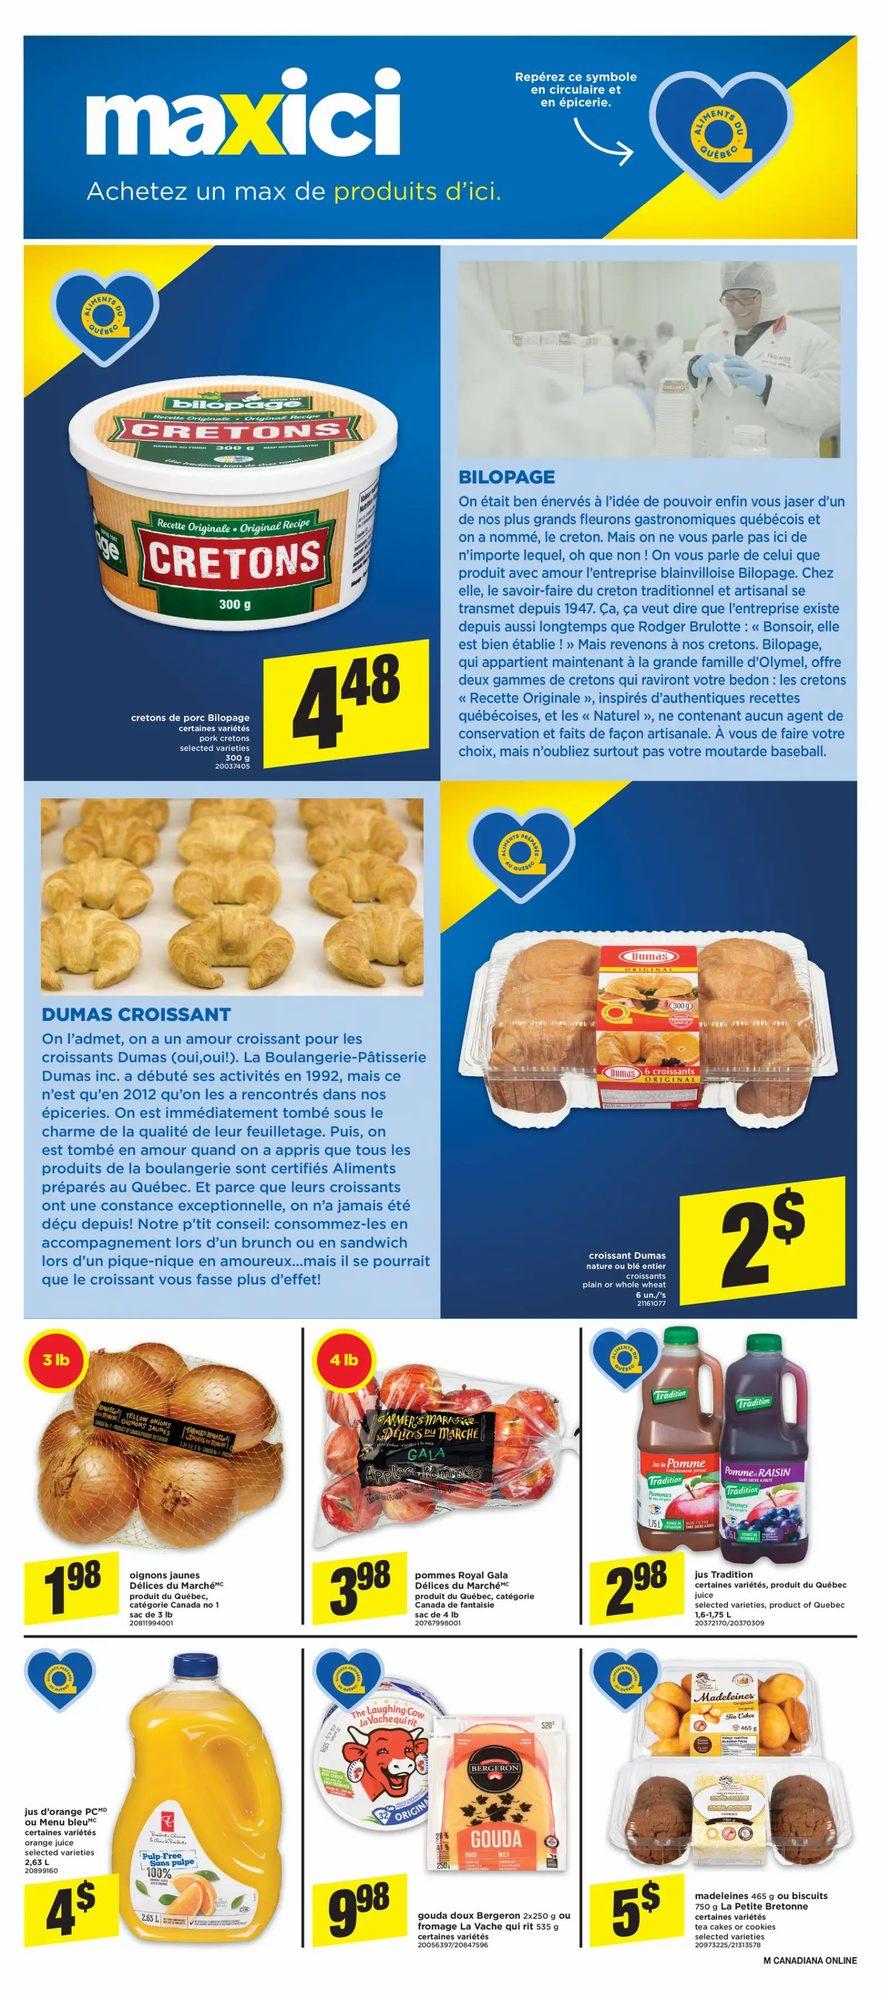 Maxi - Weekly Flyer Specials - Page 2